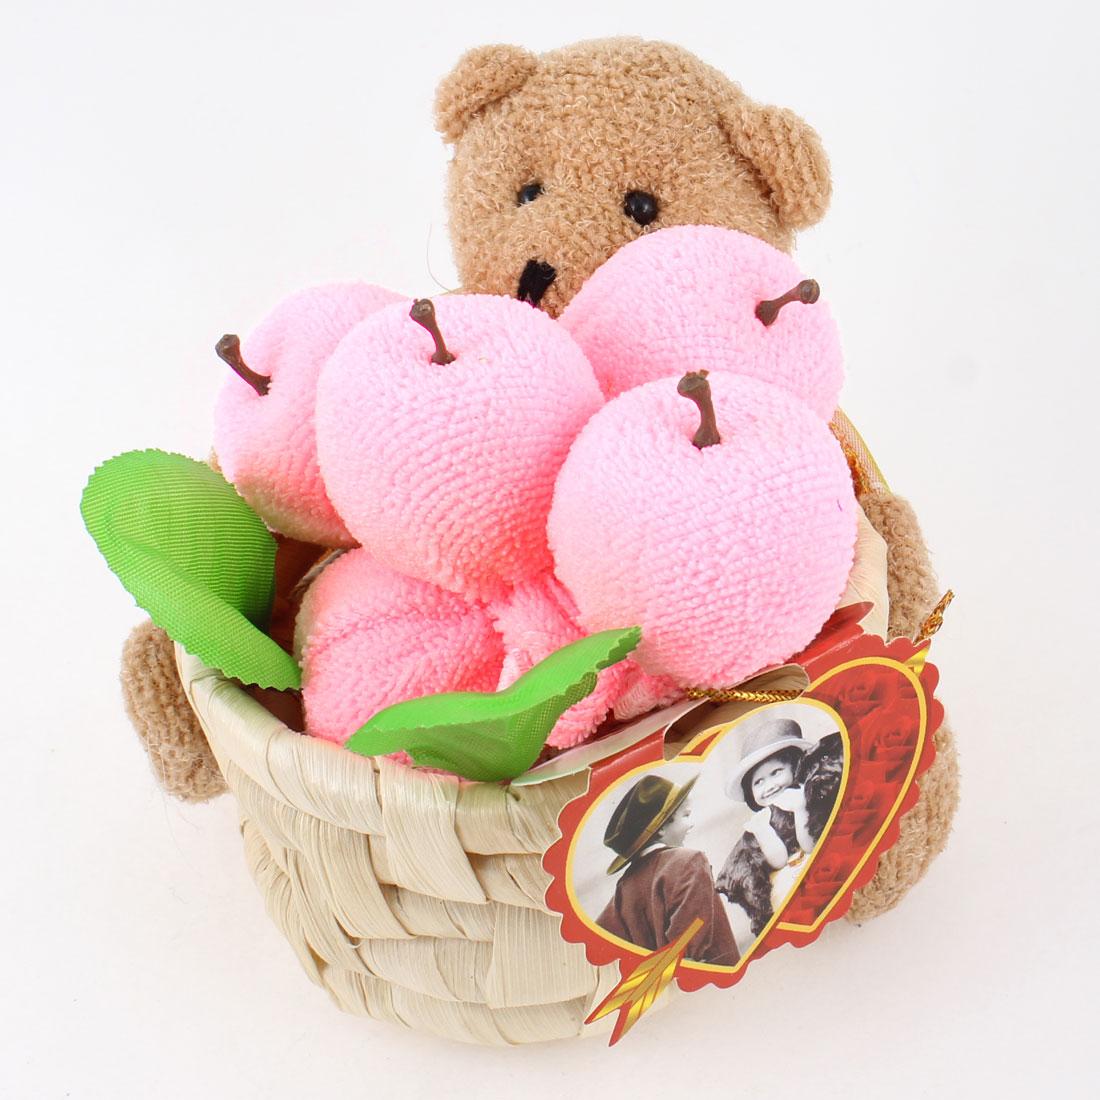 Wedding Party Ornament Colors Plaid Print Bear Basket Apple Towel Craft